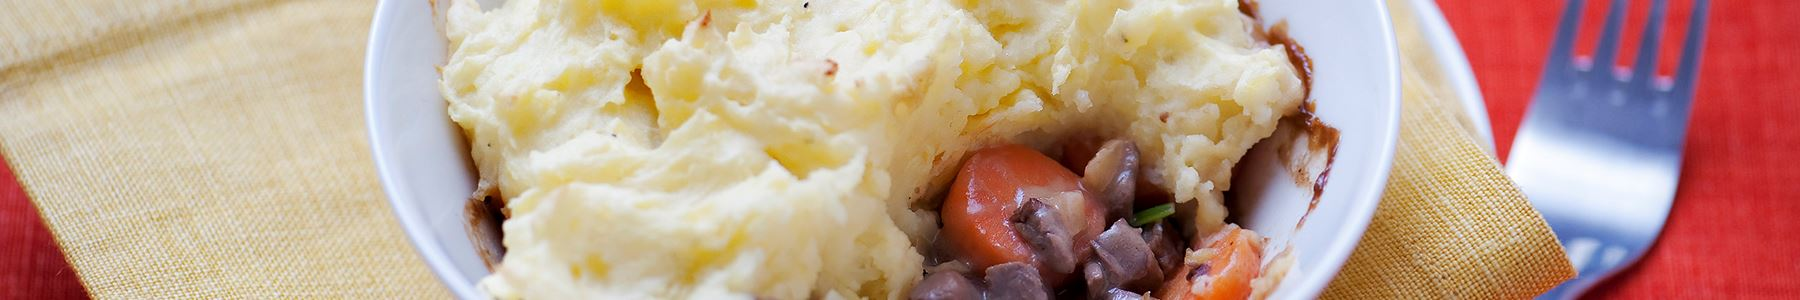 Nöt + Middag + Paj + Stekt